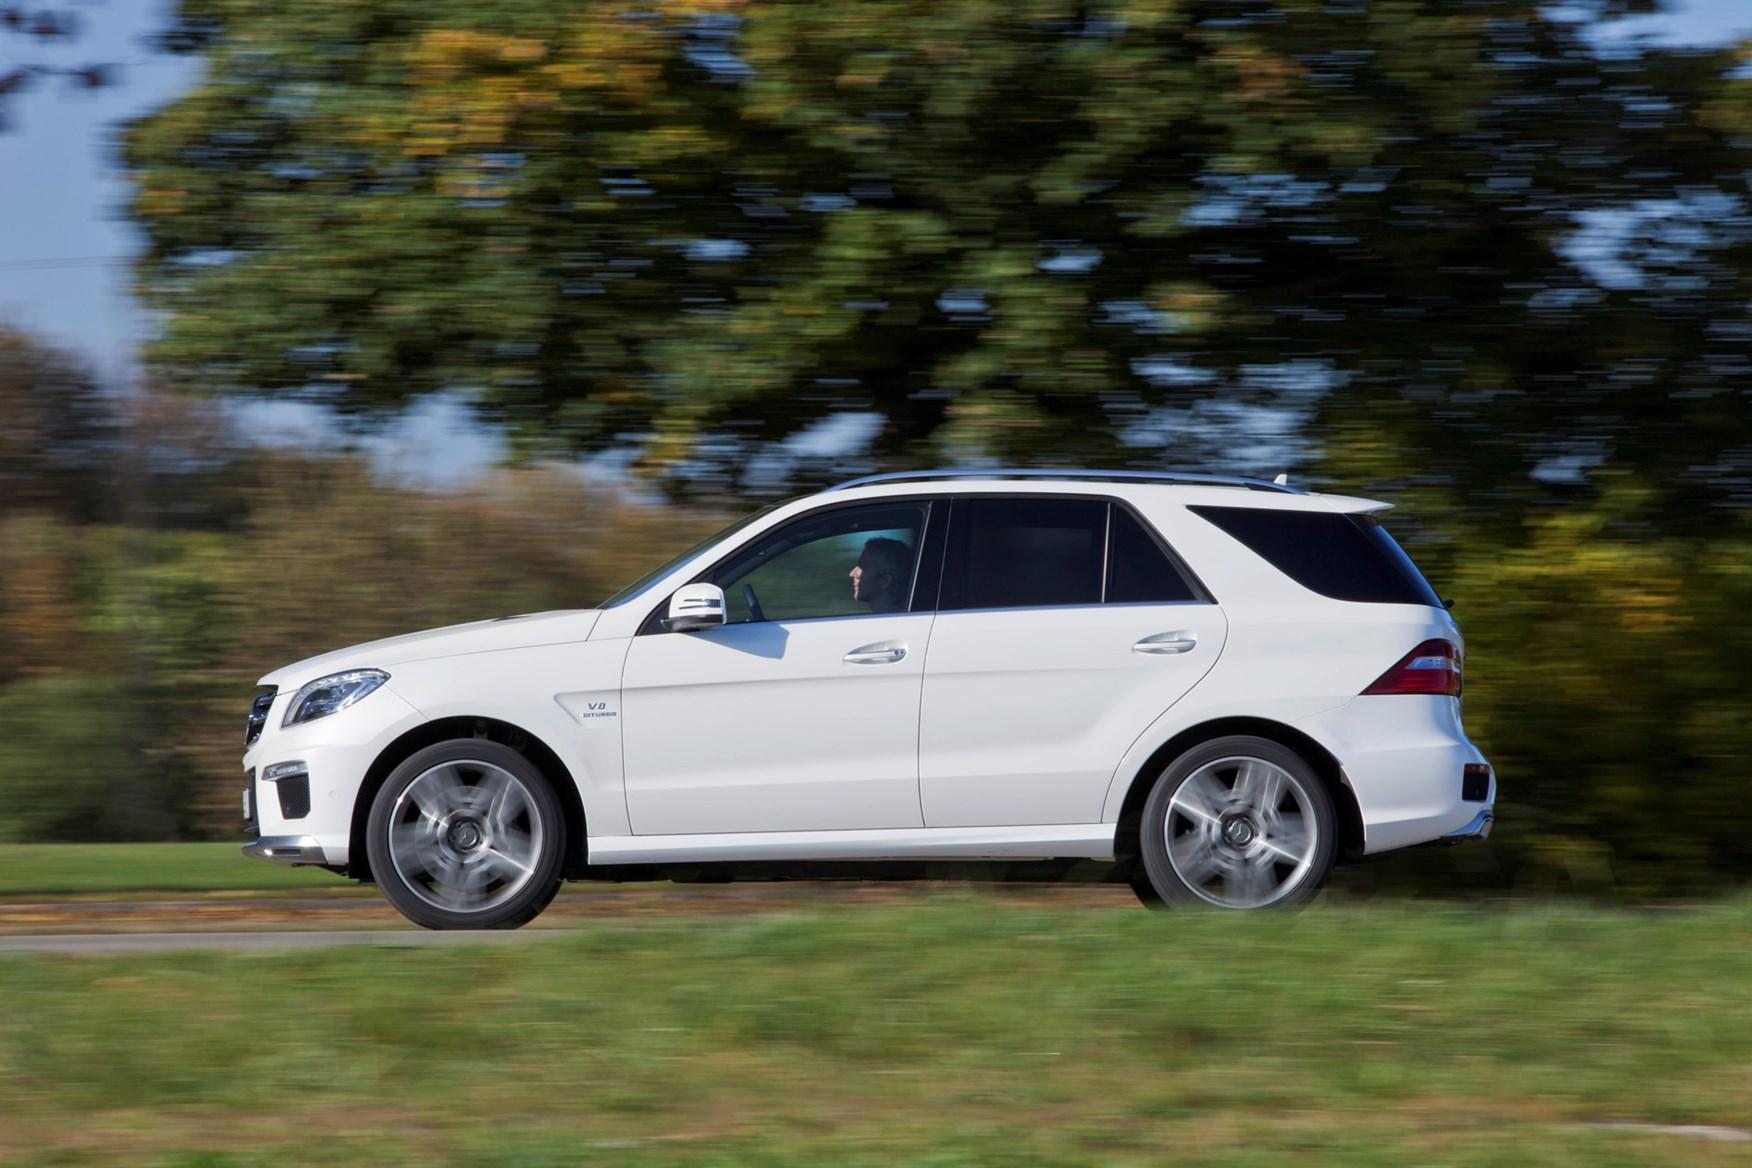 Mercedes Benz M Class Amg Review 2012 2015 Parkers